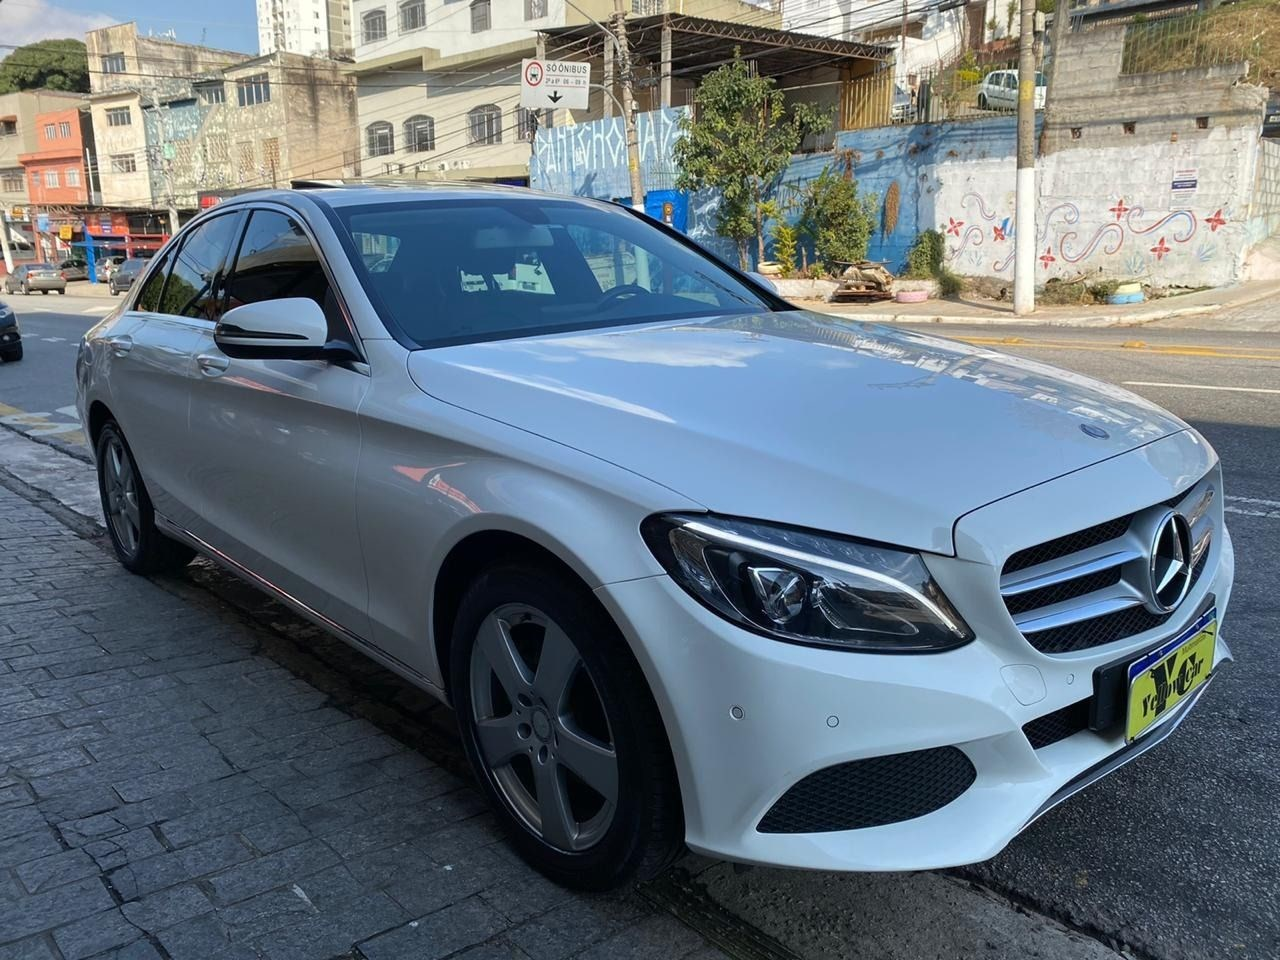 //www.autoline.com.br/carro/mercedes-benz/c-200-20-avantgarde-16v-gasolina-4p-turbo-automatic/2016/sao-paulo-sp/13908150